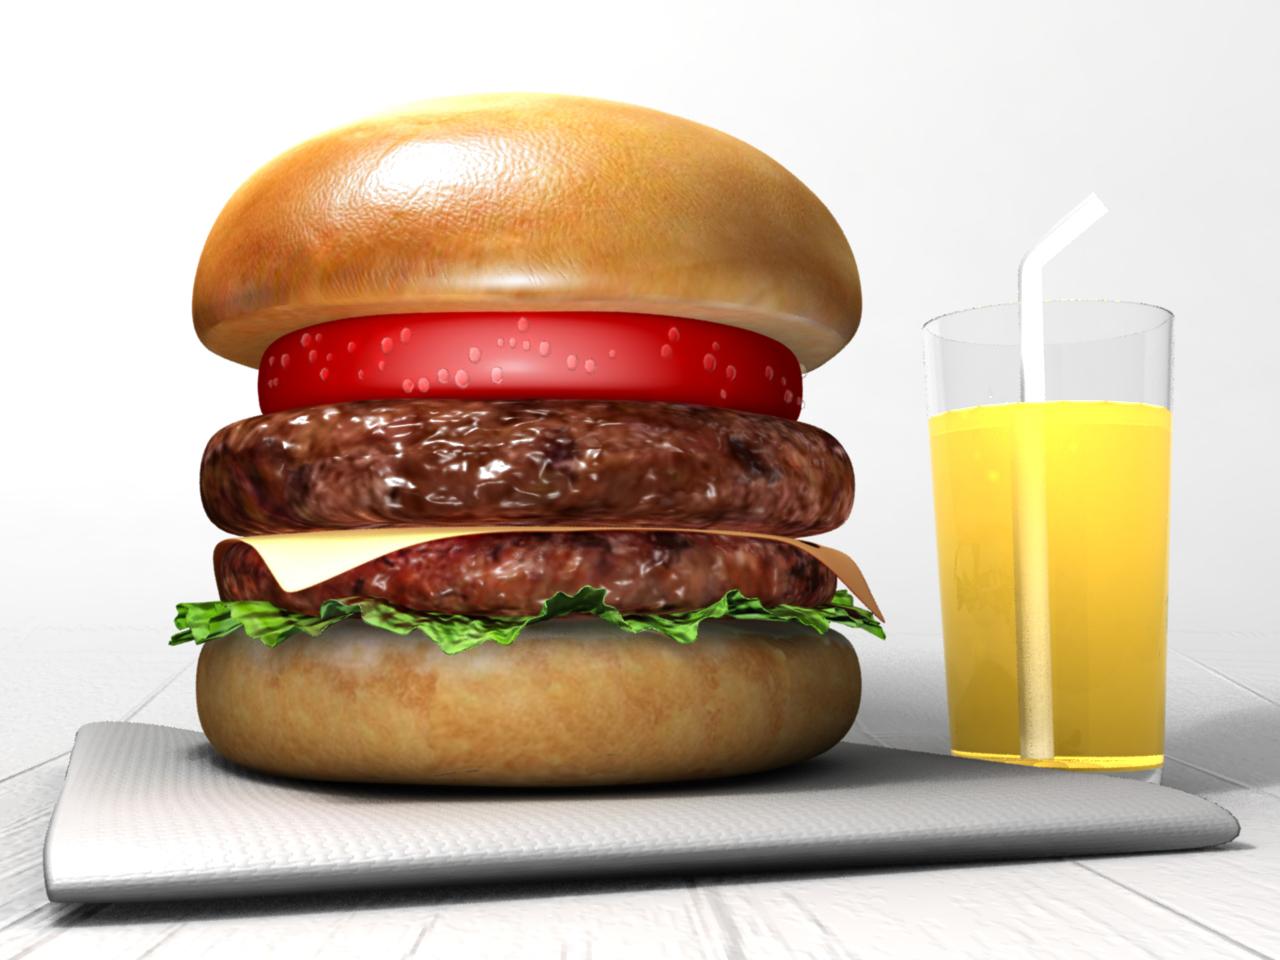 CGで作ったハンバーガーセットのレンダリング画像